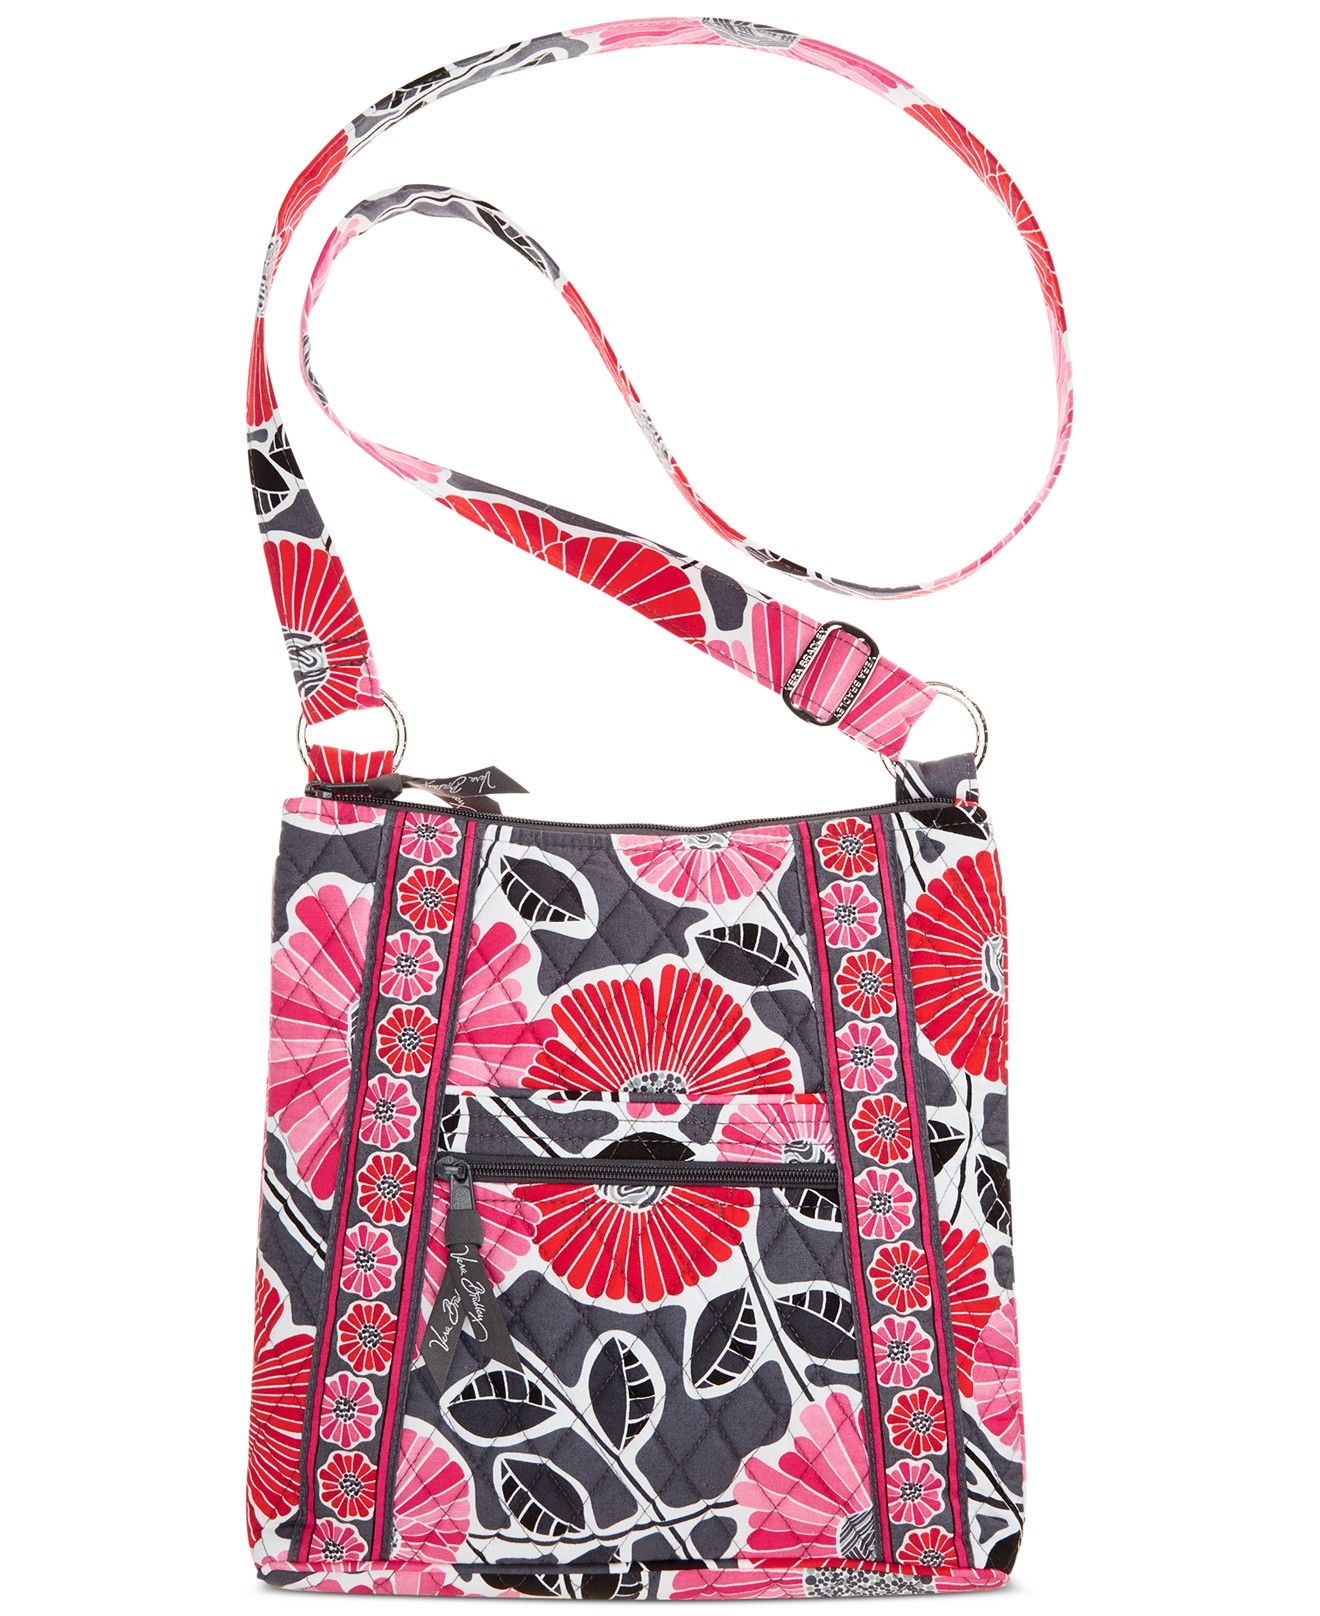 Vera Bradley Hipster Crossbody - Crossbody & Messenger Bags - Handbags & Accessories - Macy's